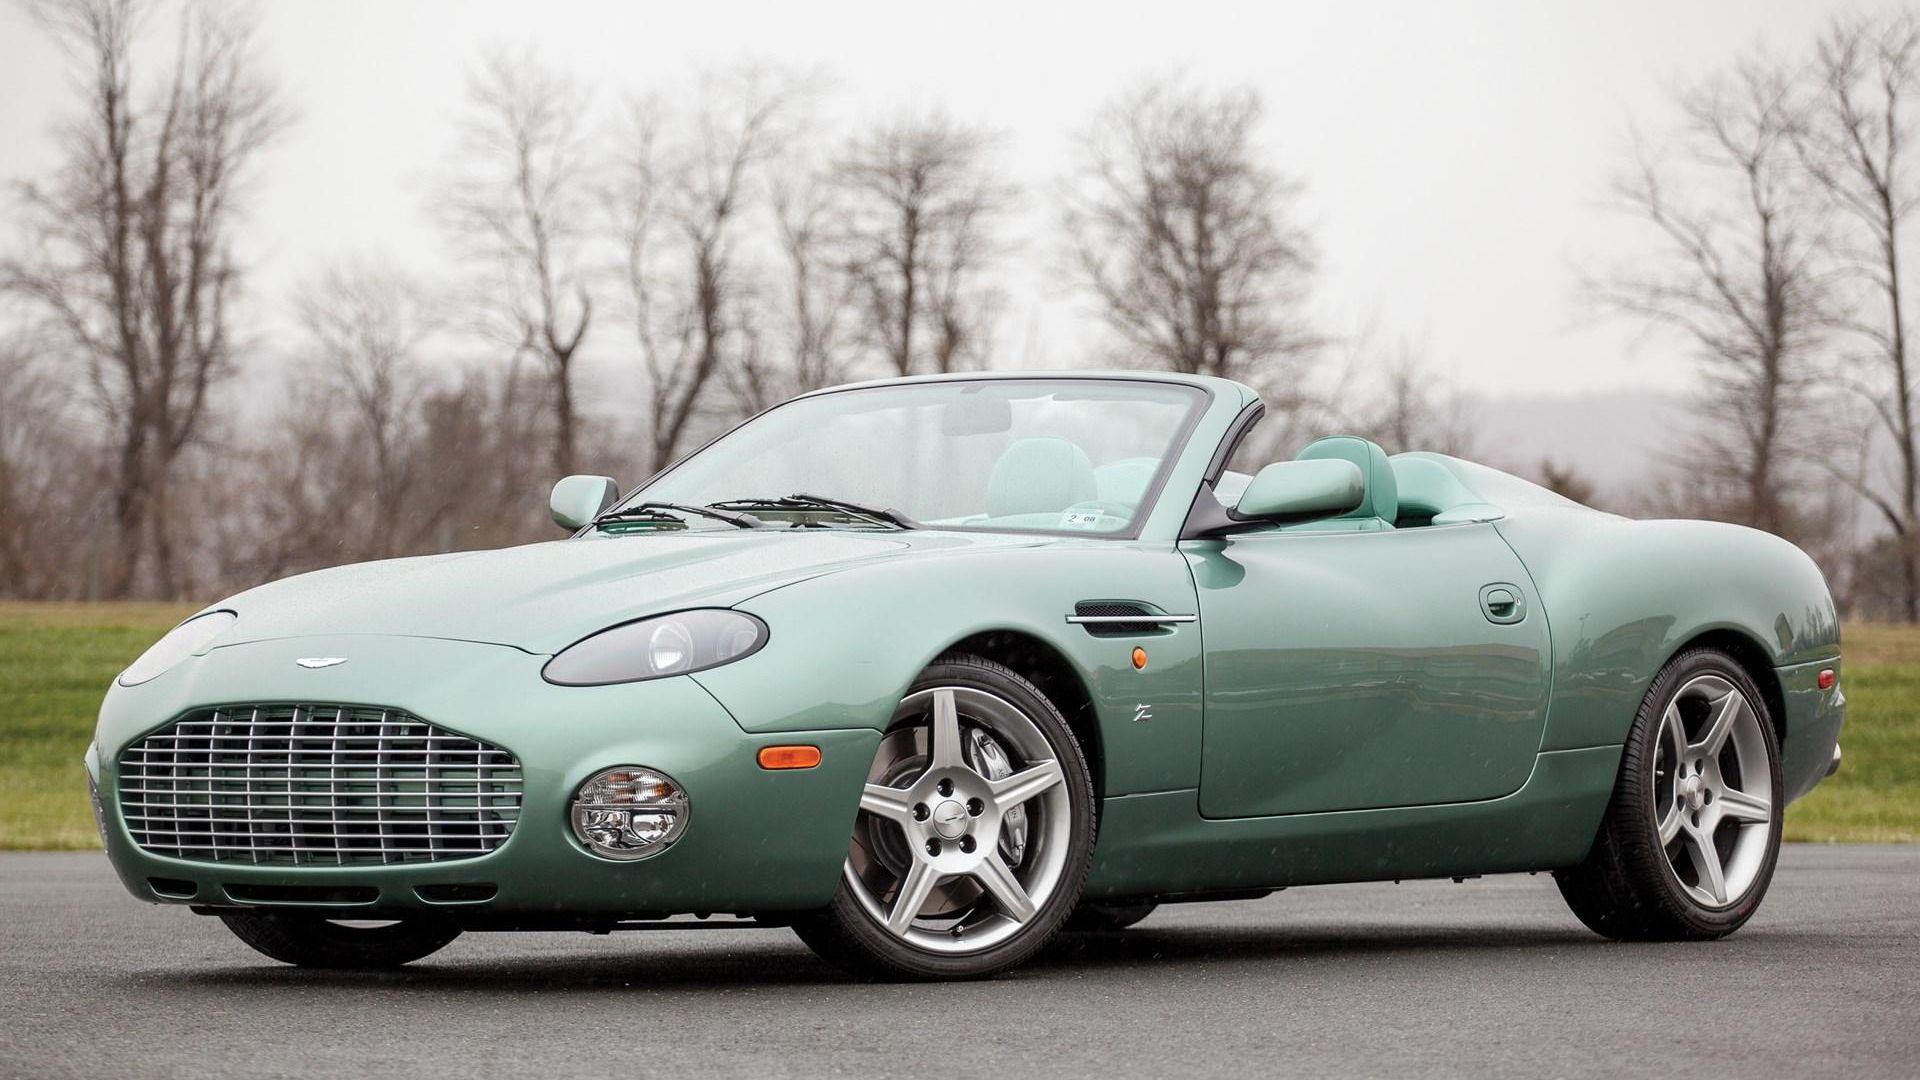 2003 Aston Martin Db Ar1 By Zagato Vin Scfae62303k800002 Classic Com